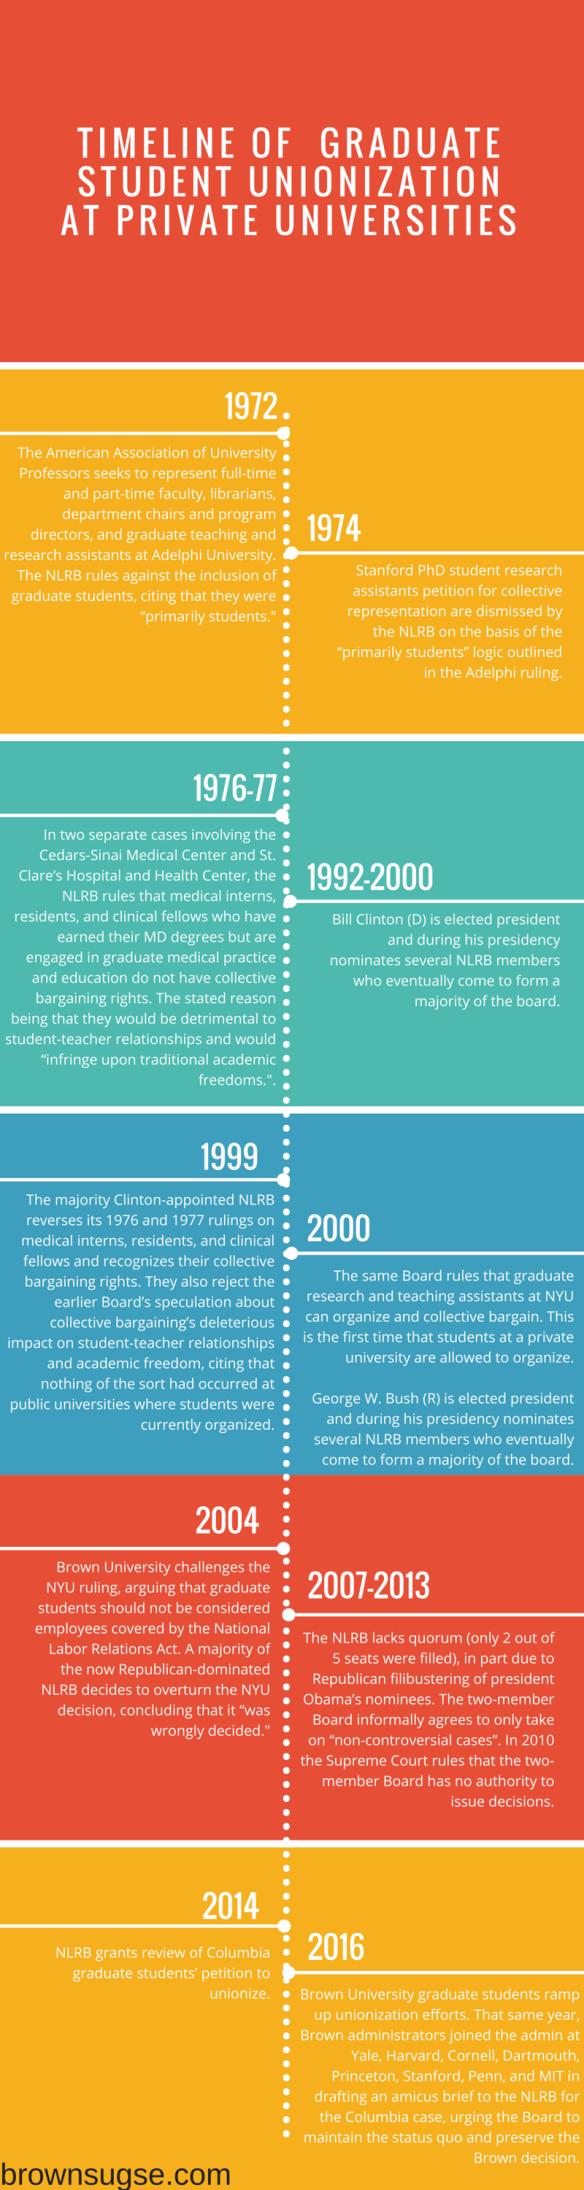 grad unionization timeline